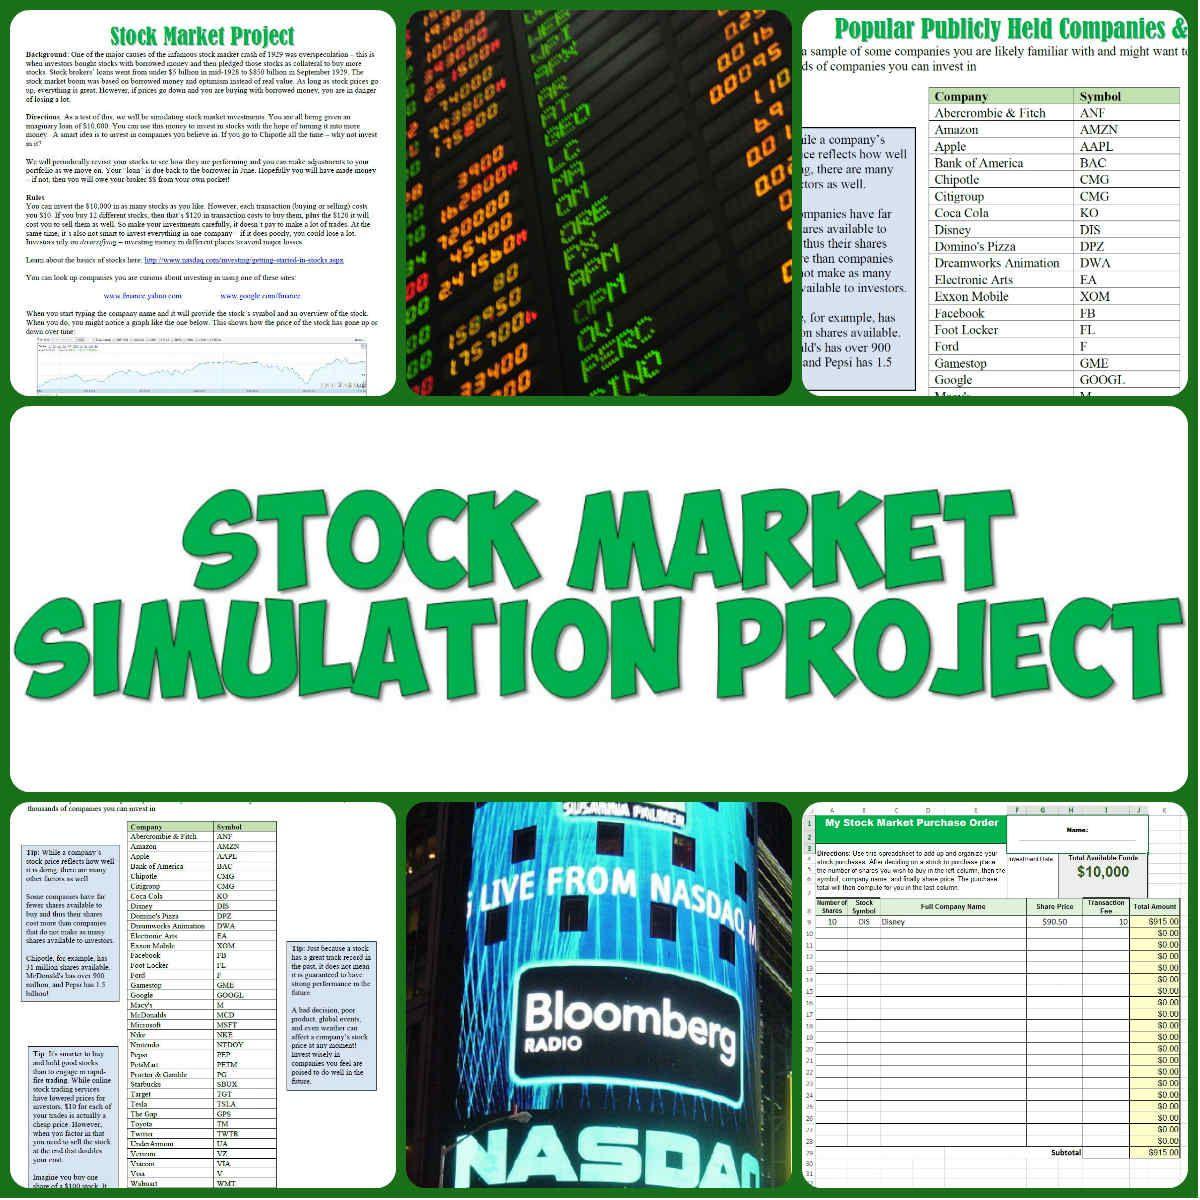 Stock Market Simulation Project